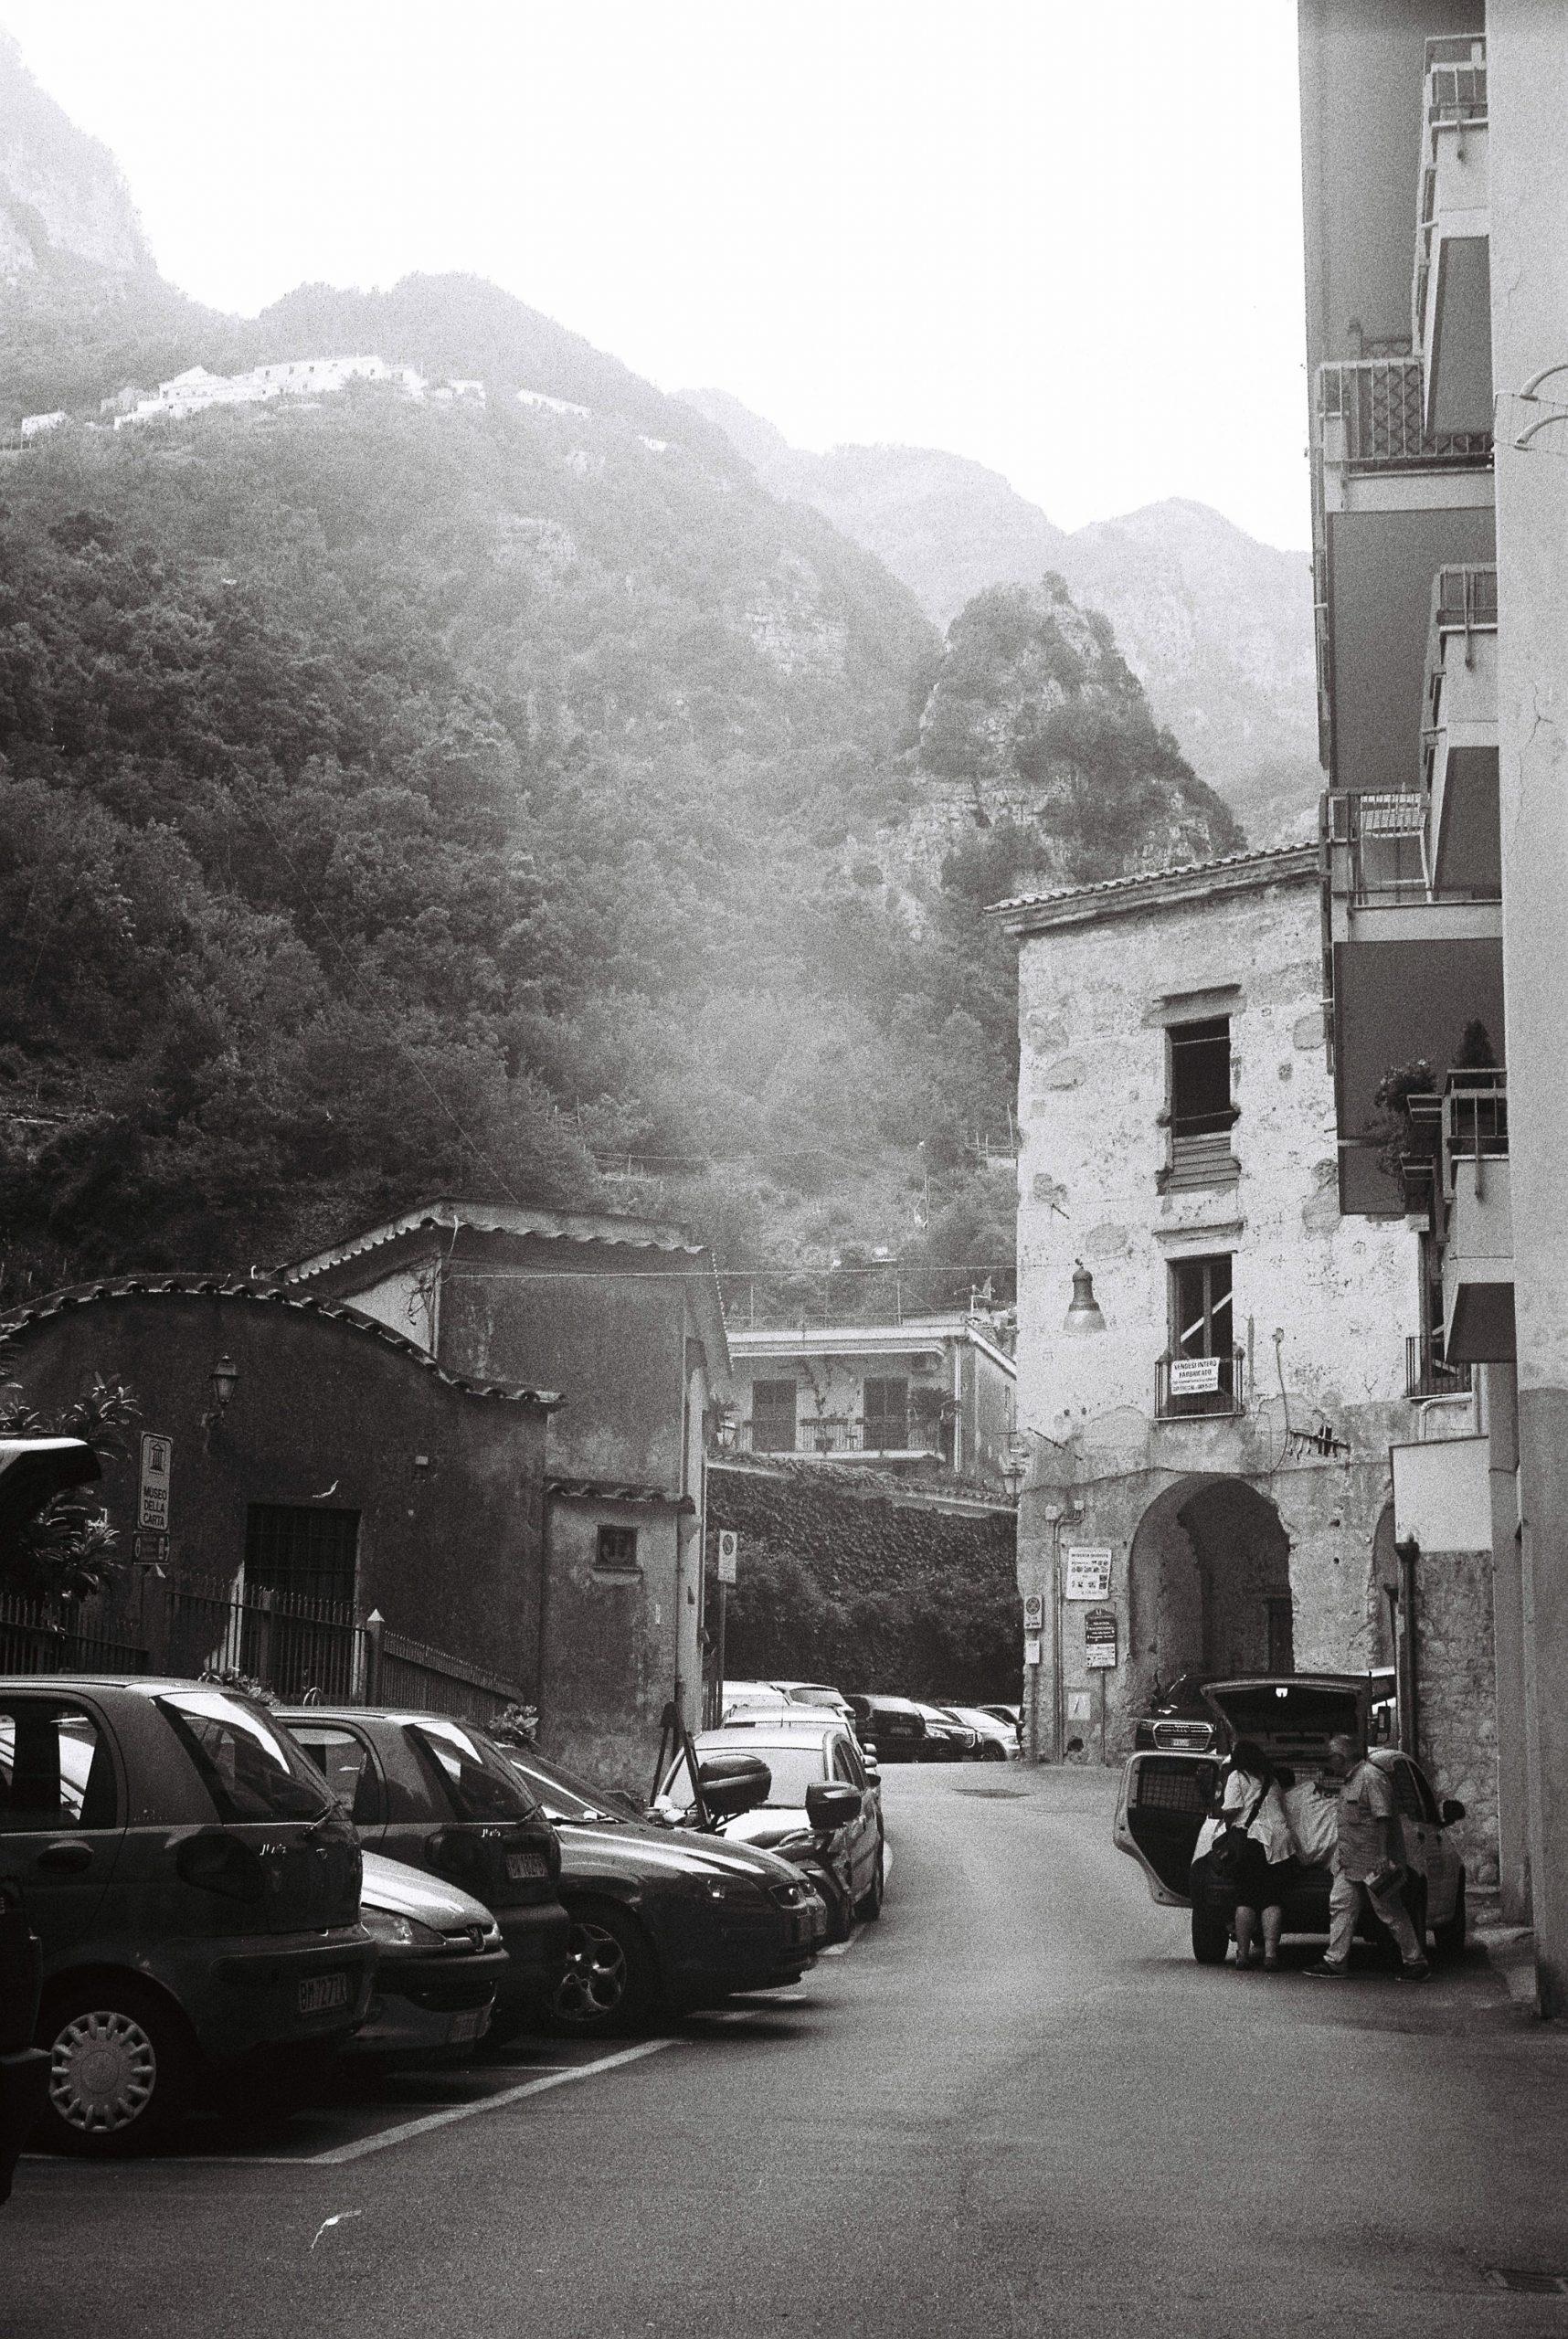 Categorie: Reportage, Street; Photographer: ALESSANDRO GIUGNI; Location: Milano (MI), Venezia (VE), Bergamo (BG), Montevecchia (LC), Lugo (RA), Brunico (BZ), Innsbruck (Austria)